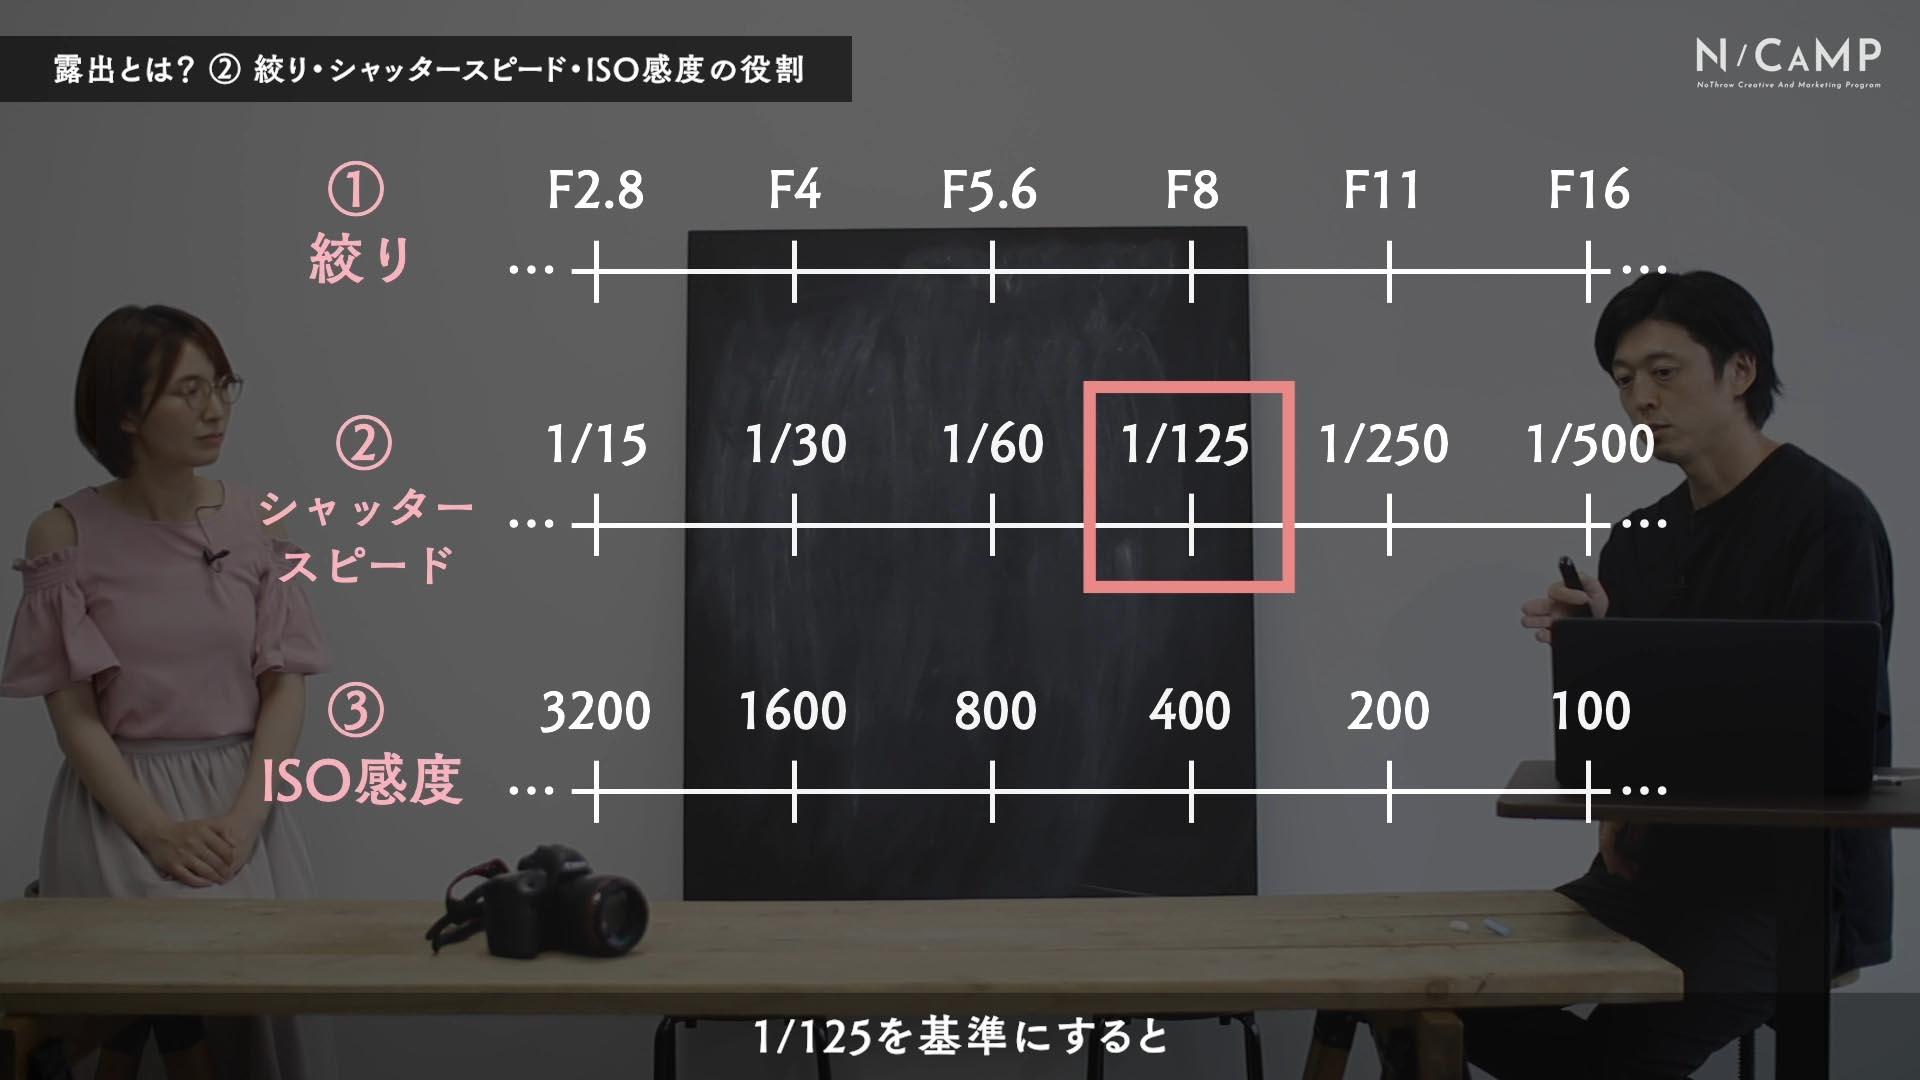 【C-013】露出とは?②〜露出の「明るさ以外」の役割を知る〜2